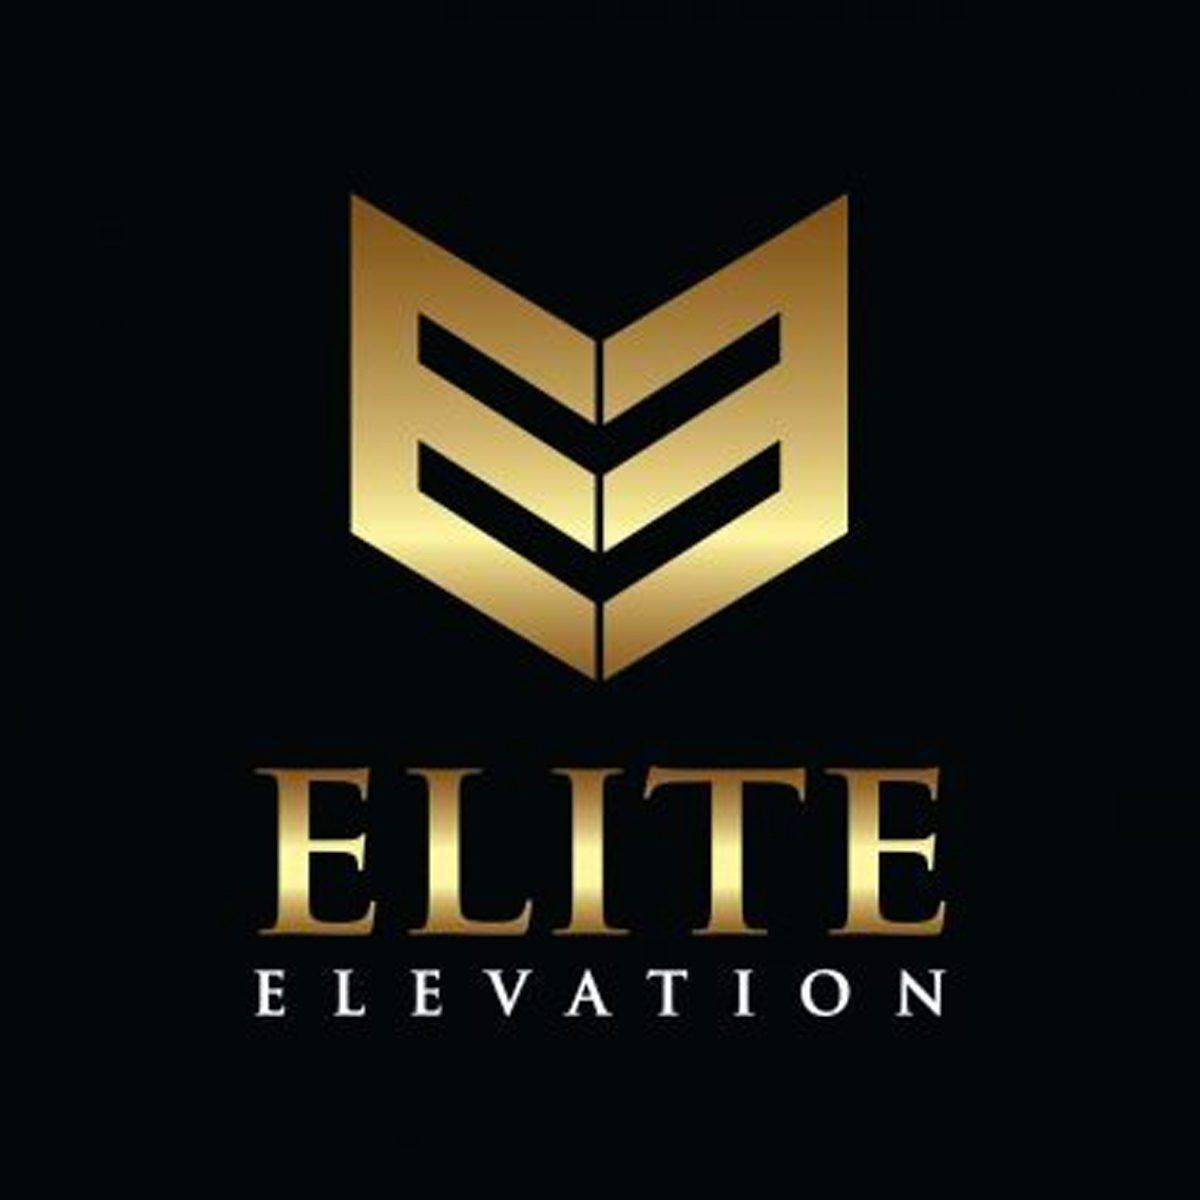 elite elevation